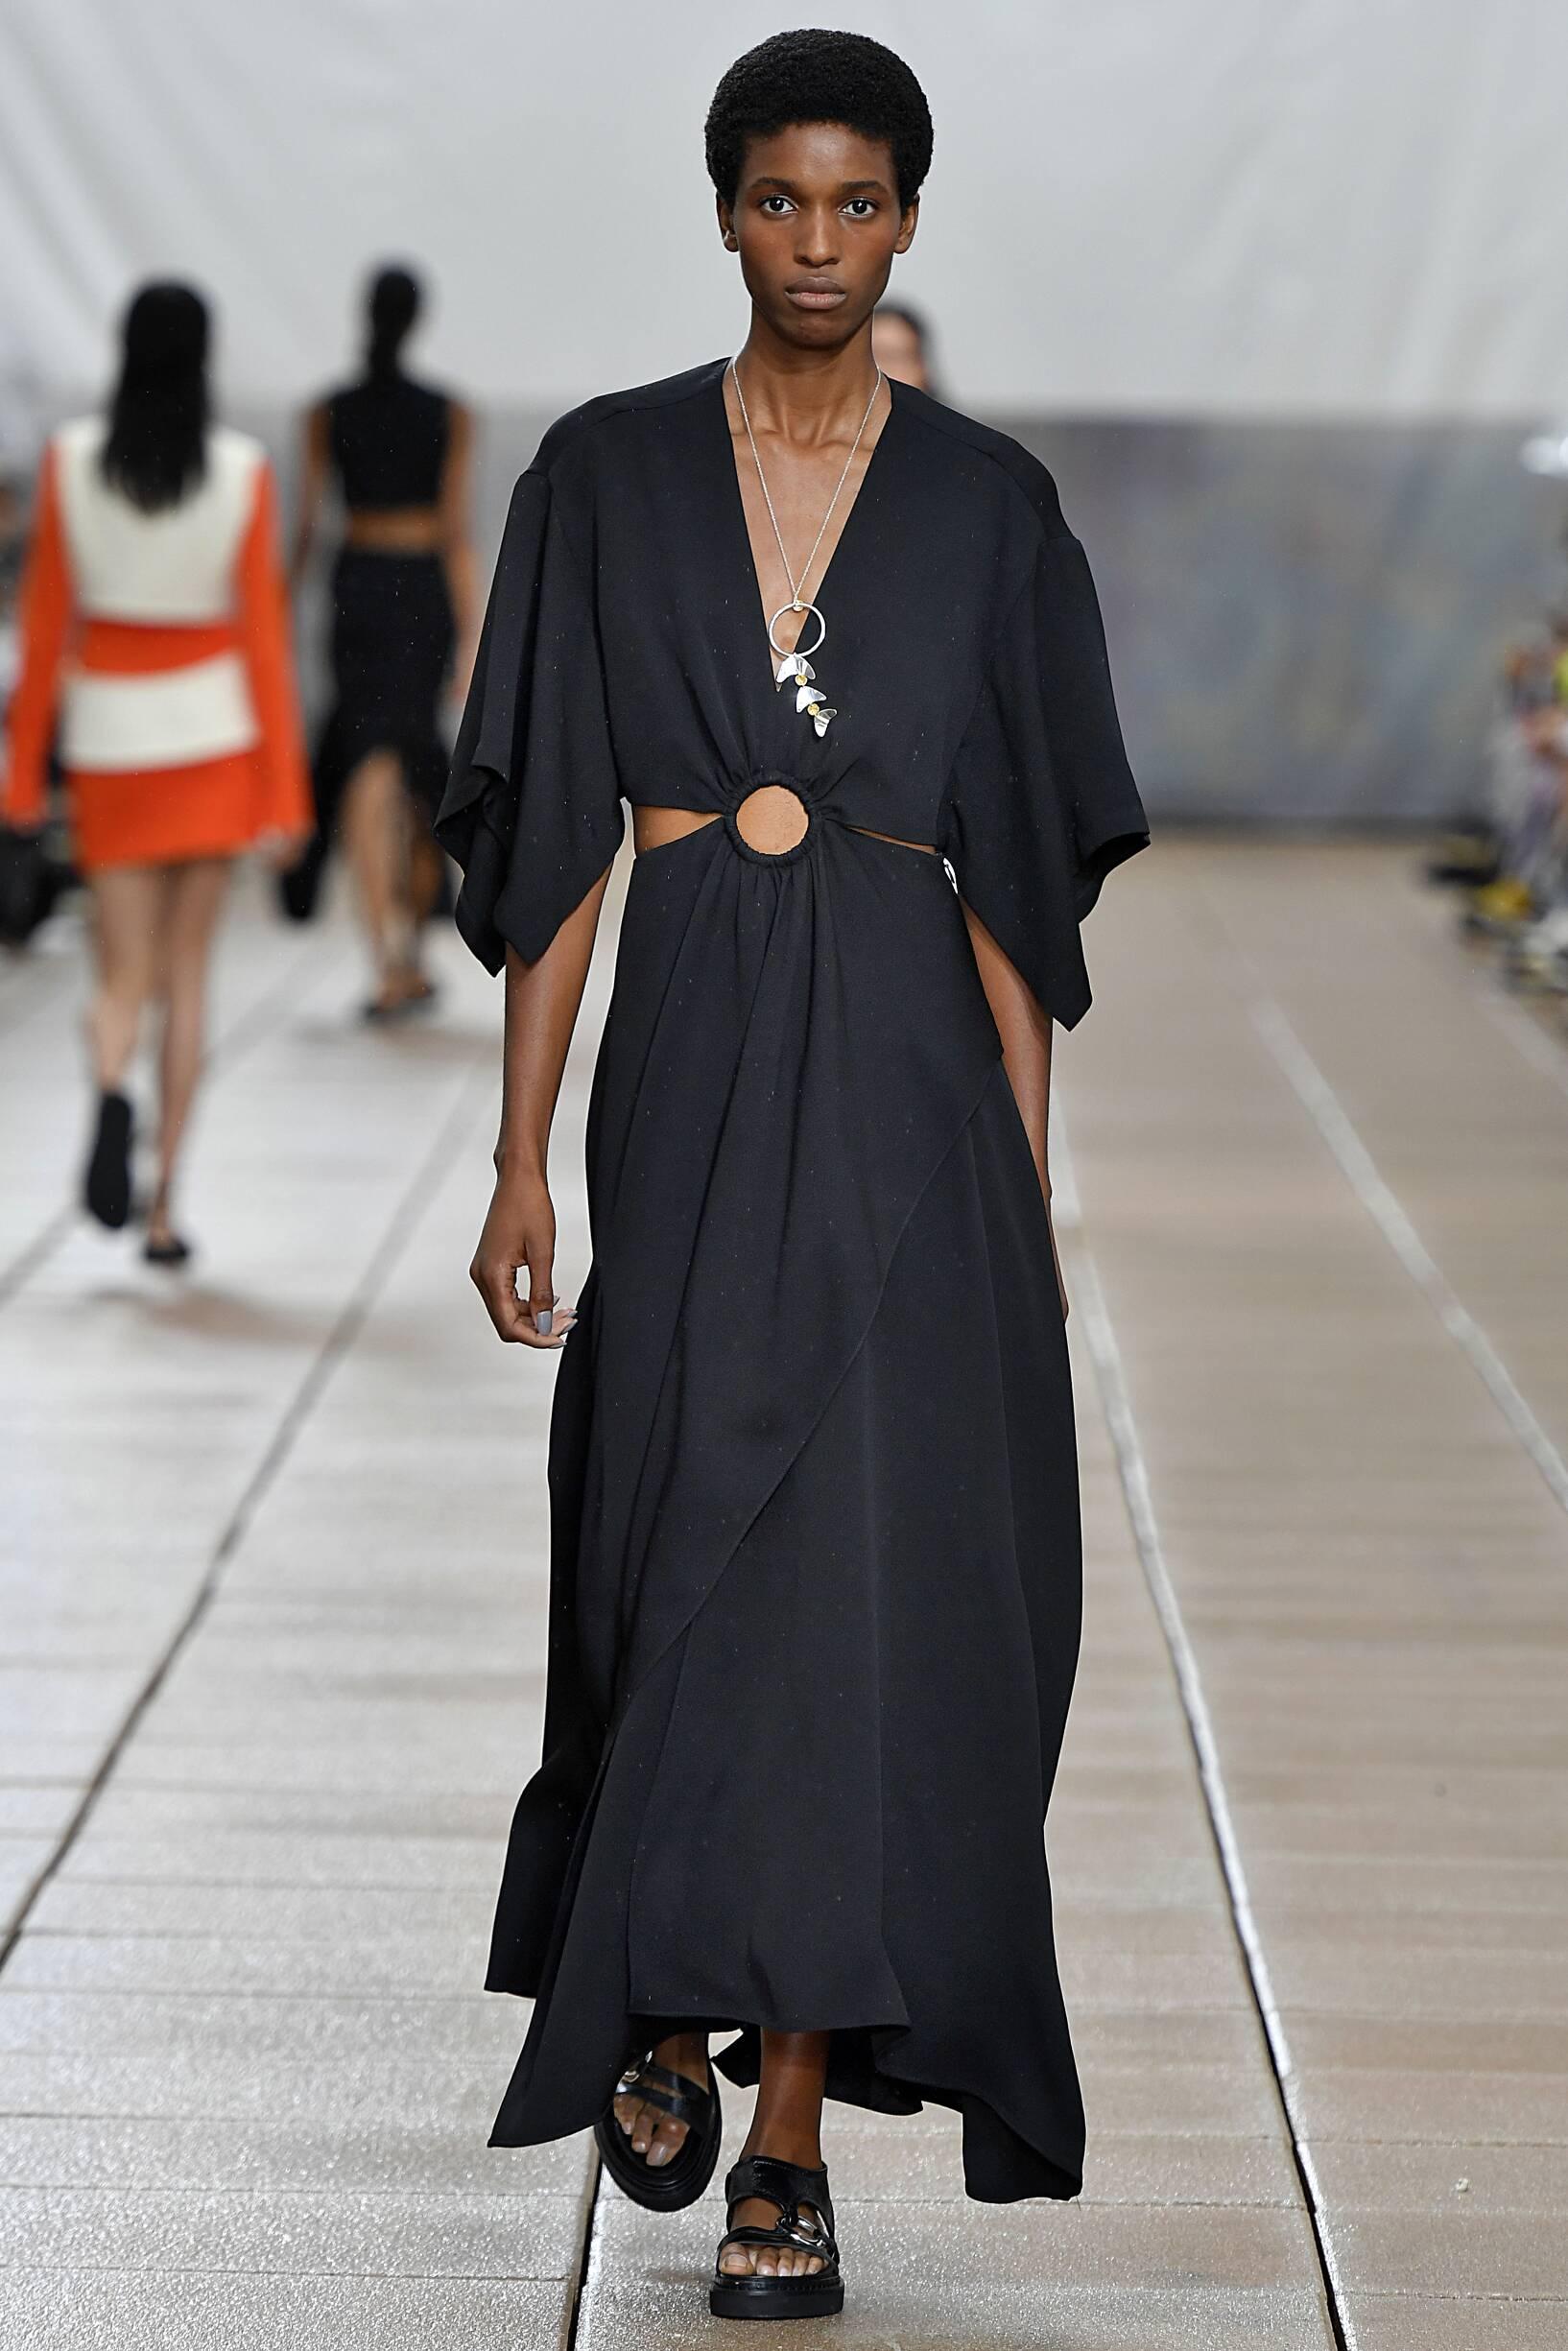 Catwalk 3.1 Phillip Lim Woman Fashion Show Summer 2019